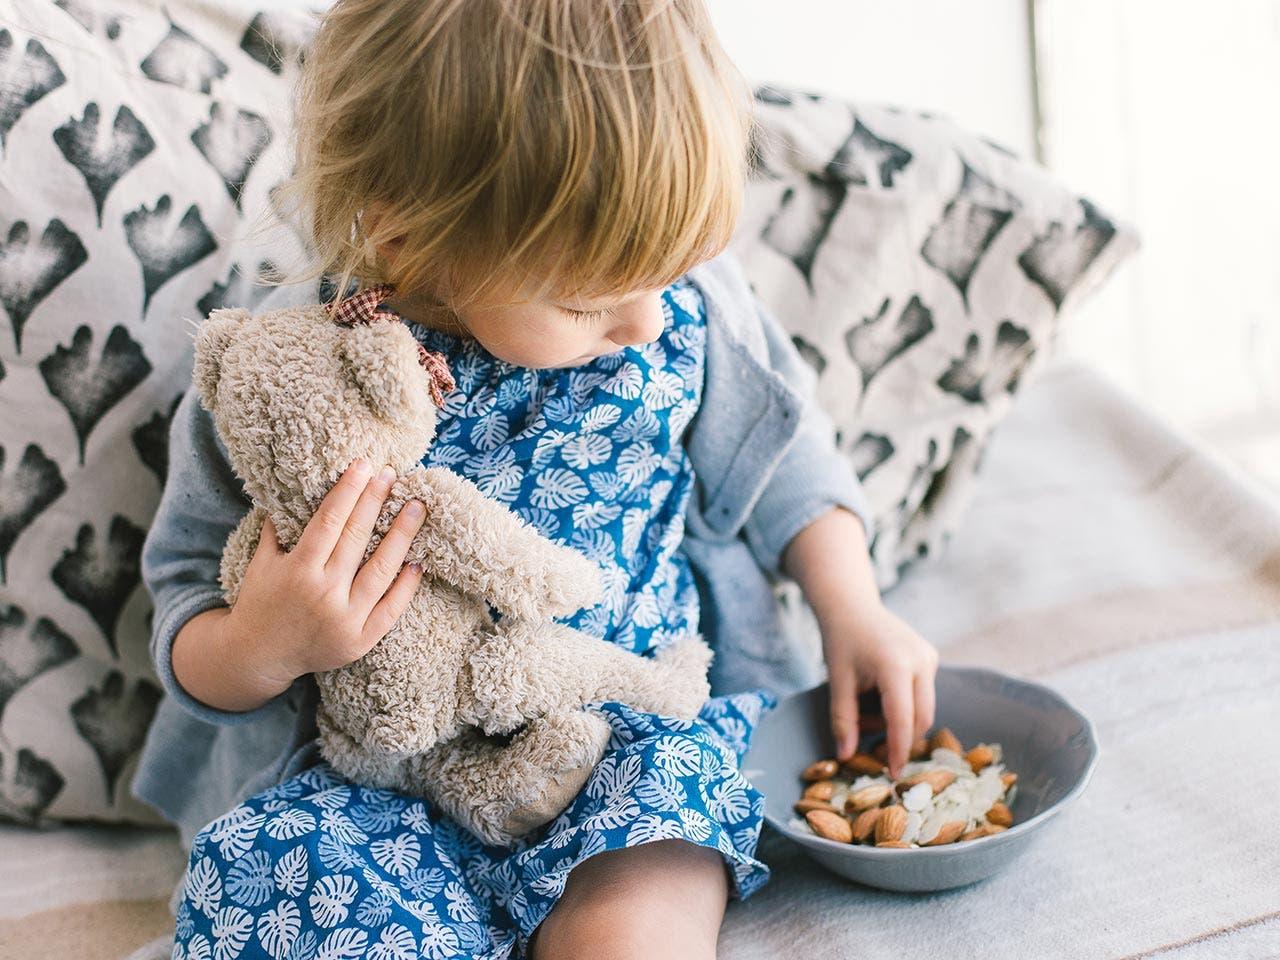 Eat nuts | Tetiana Iatsenko/Shutterstock.com